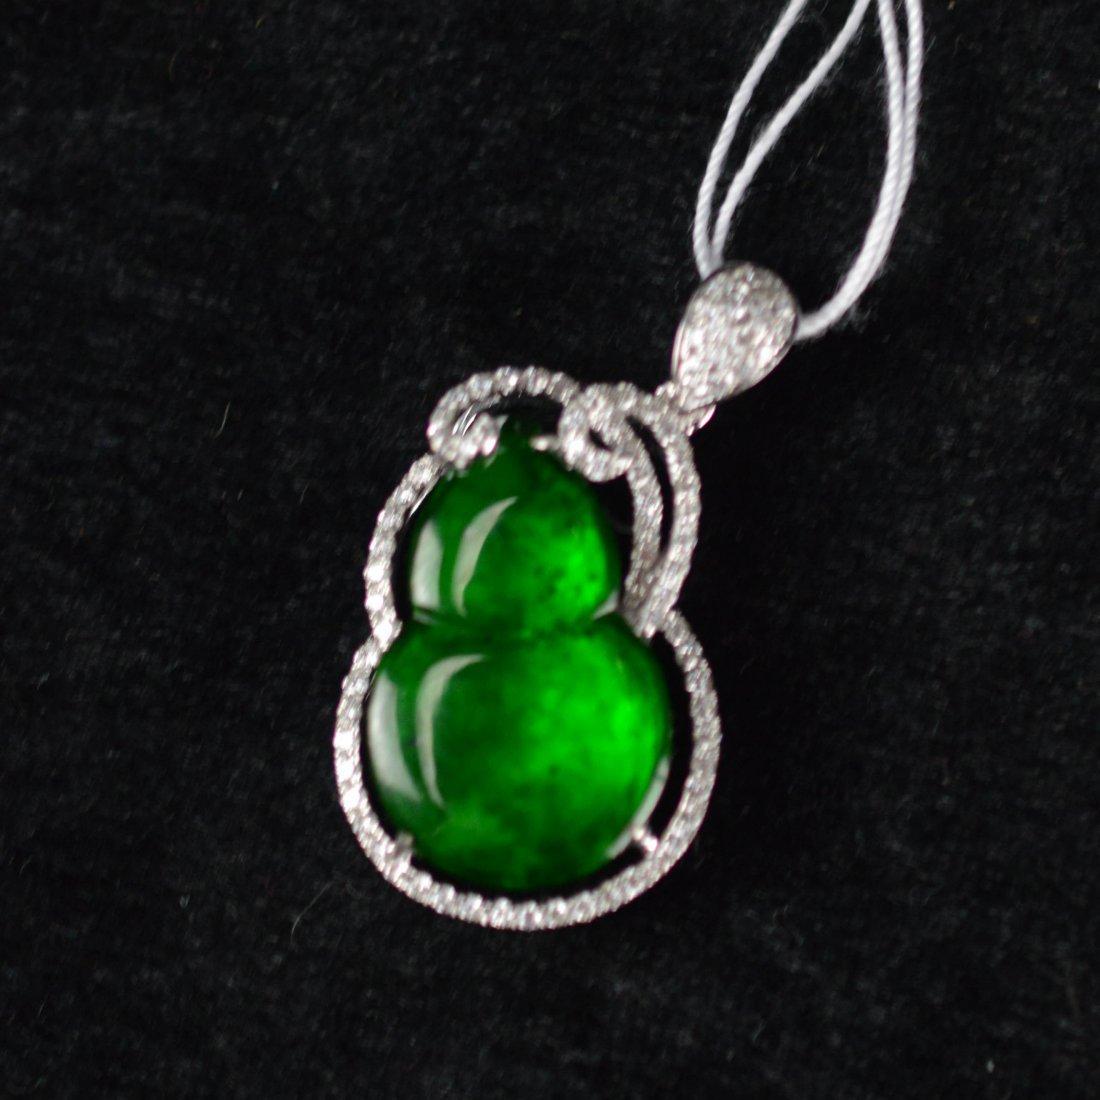 18K White Gold Natural Burma Icy jadeite necklace